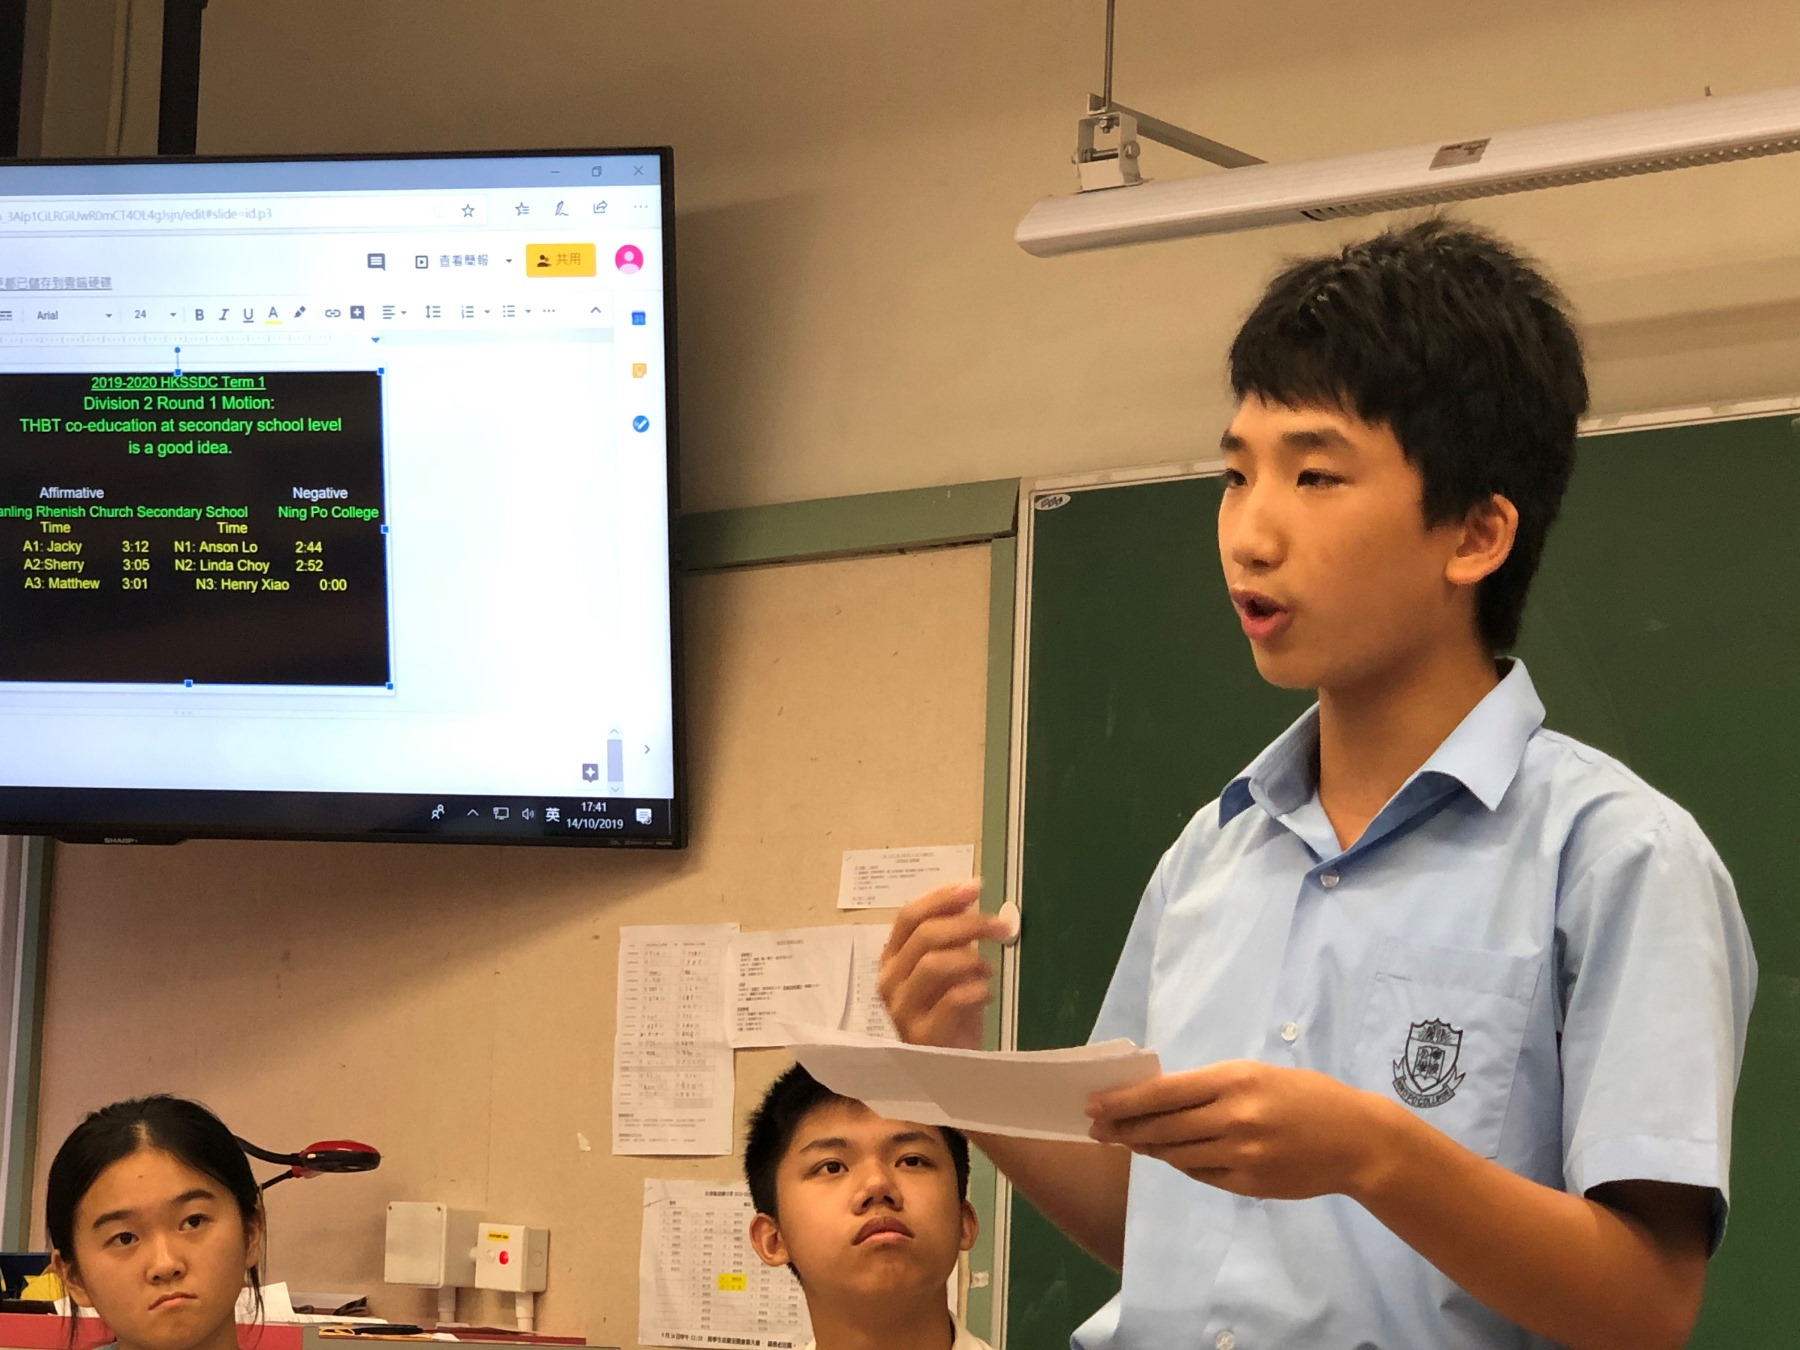 https://npc.edu.hk/sites/default/files/img_7256_1.jpg